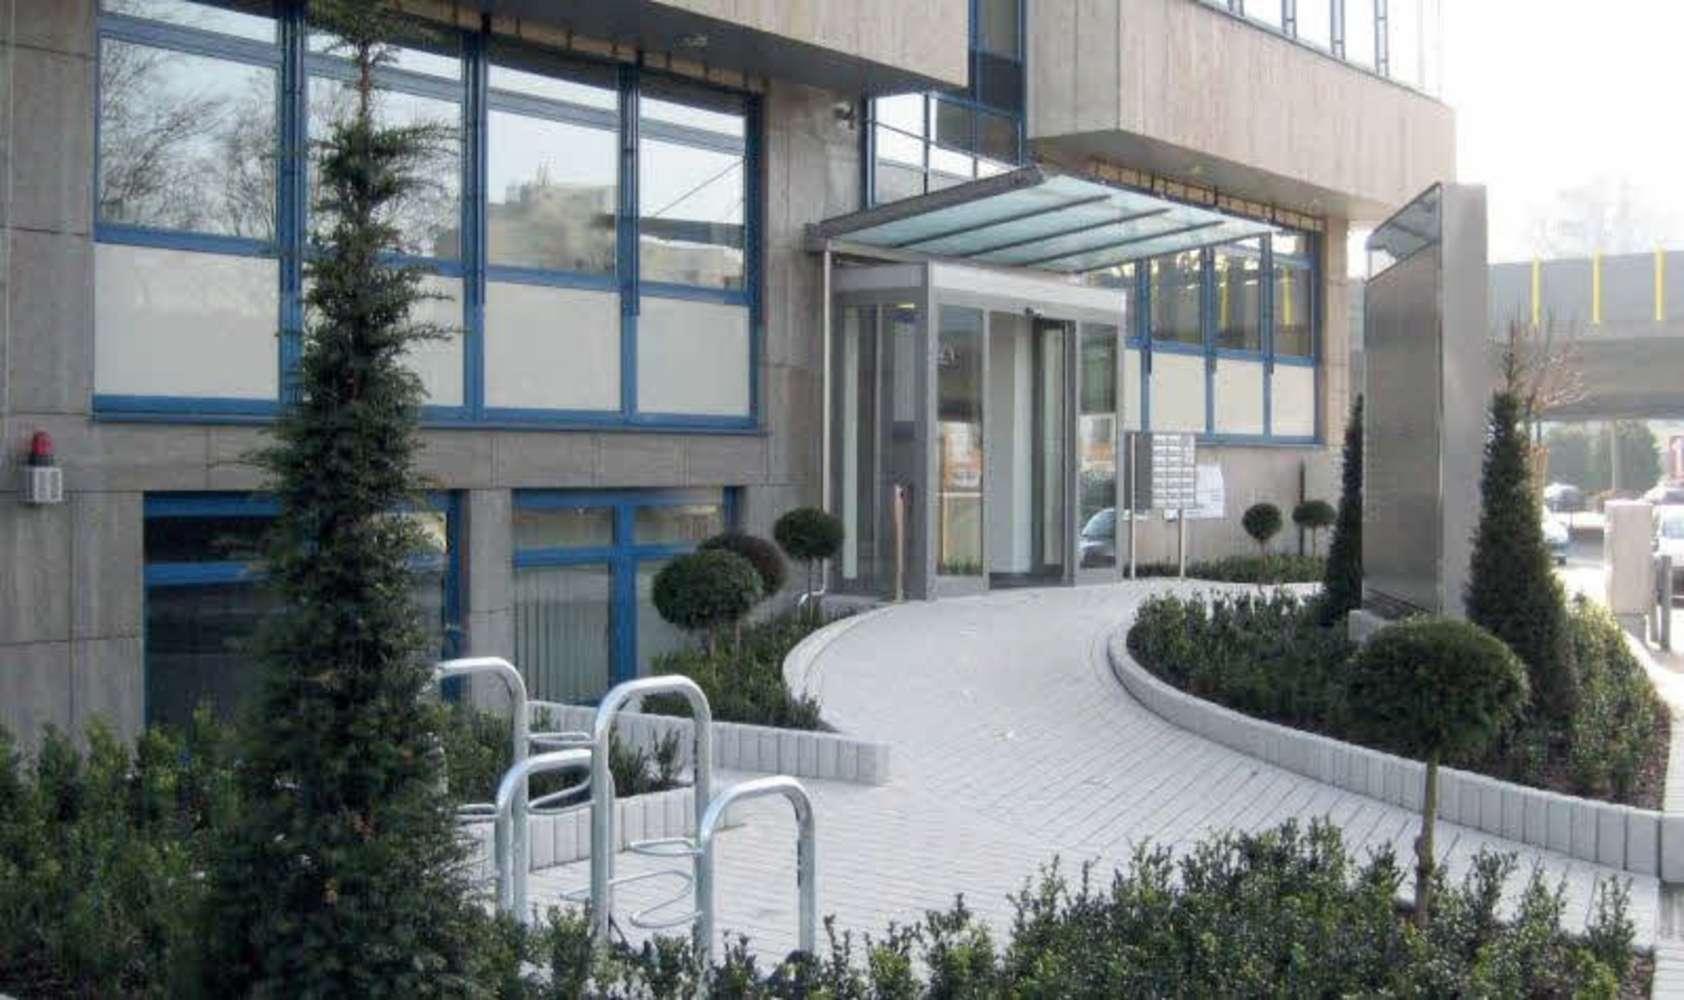 Büros Frankfurt am main, 60488 - Büro - Frankfurt am Main, Hausen - F1796 - 10038217